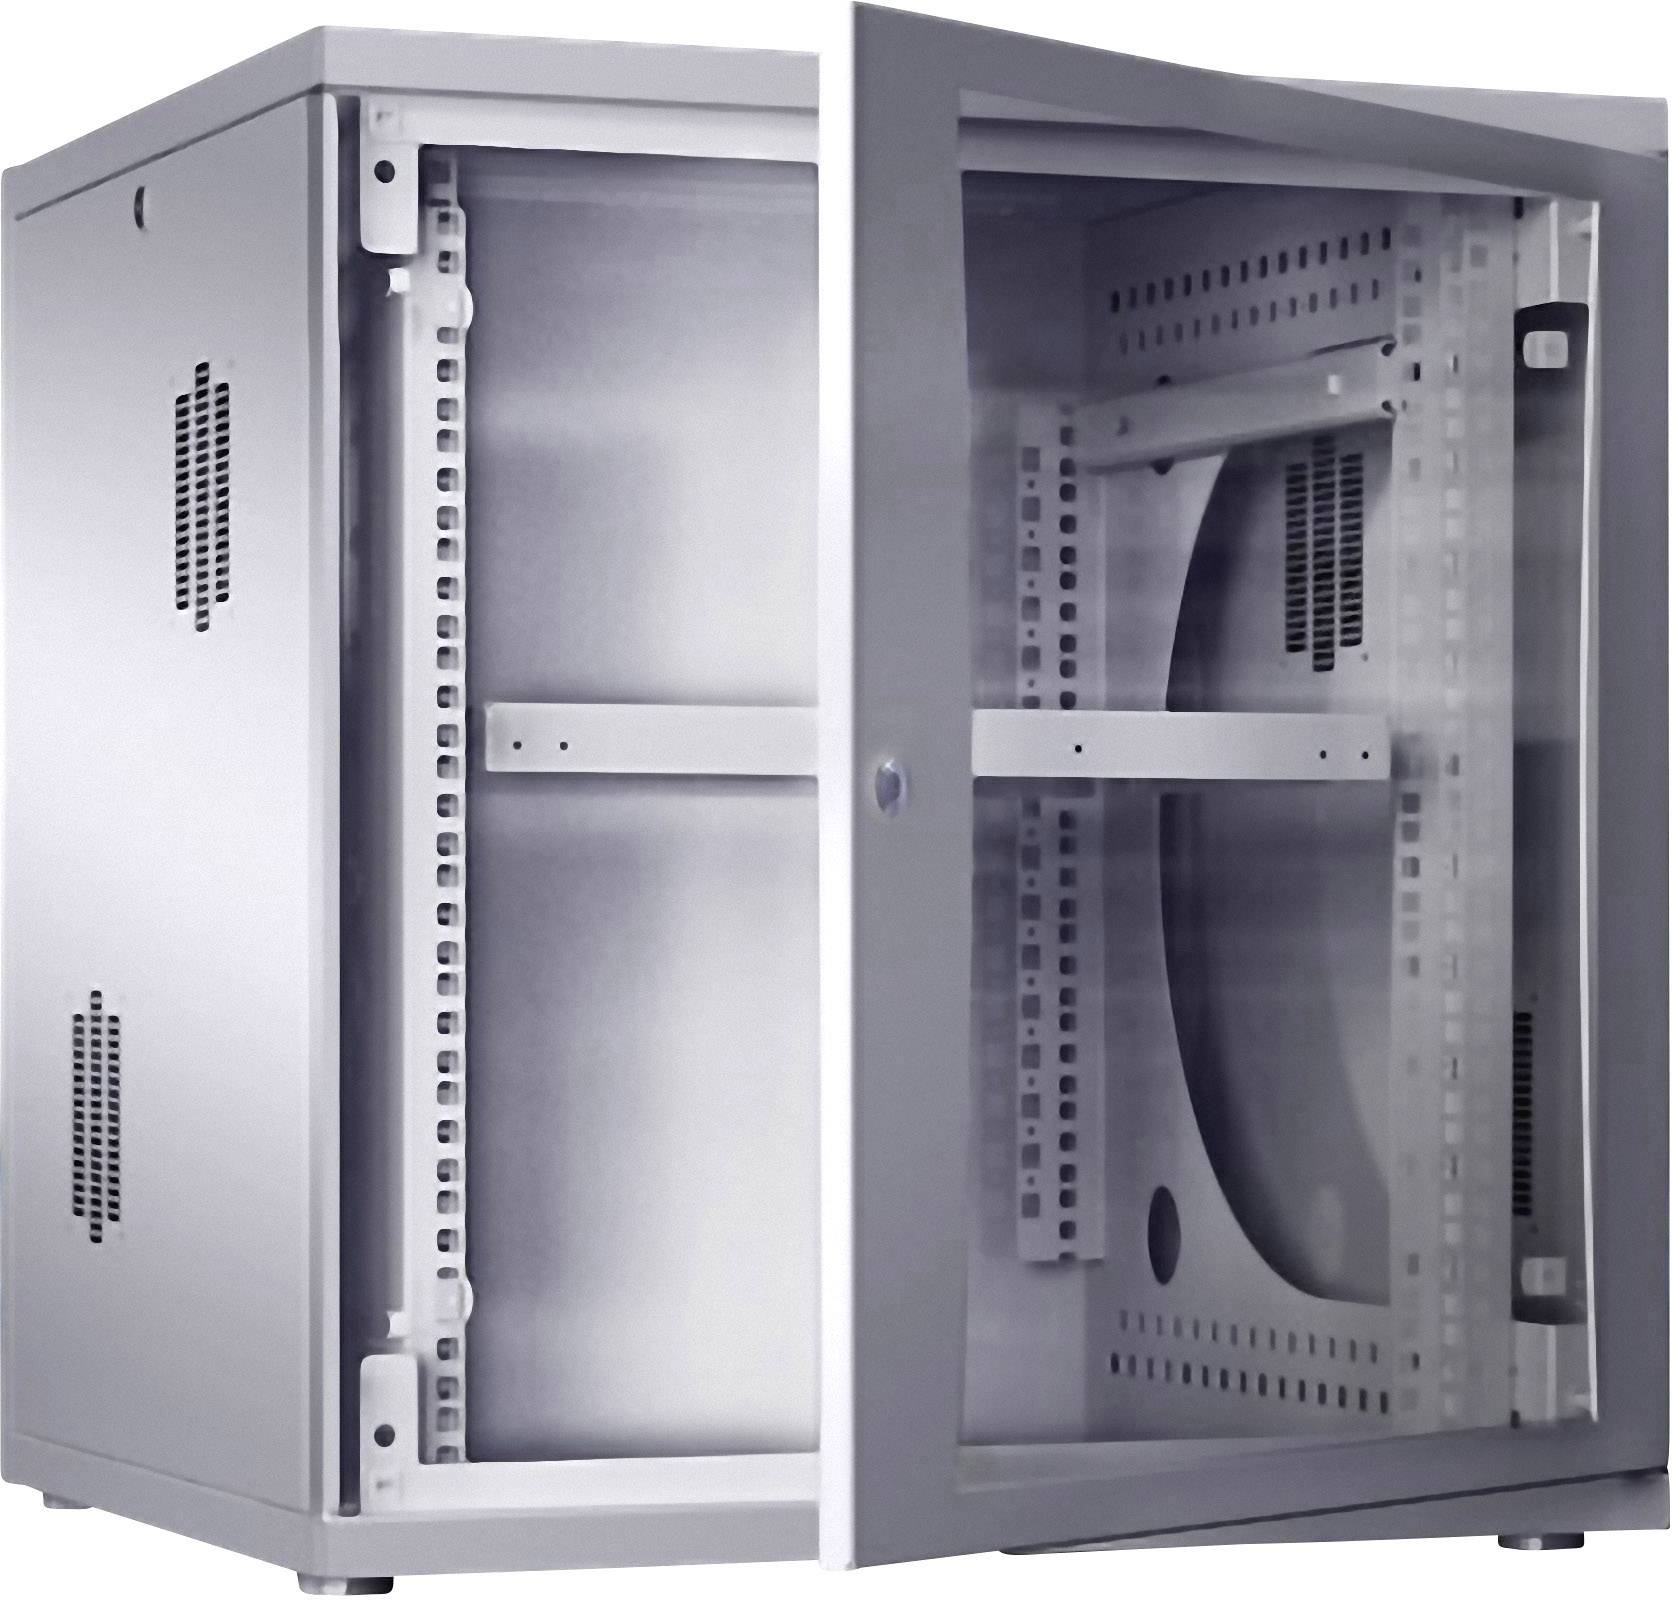 rittal 7507 120 19 server rack cabinet w x h x d 600 x 625 x 600 mm 12 he grey white ral 7035